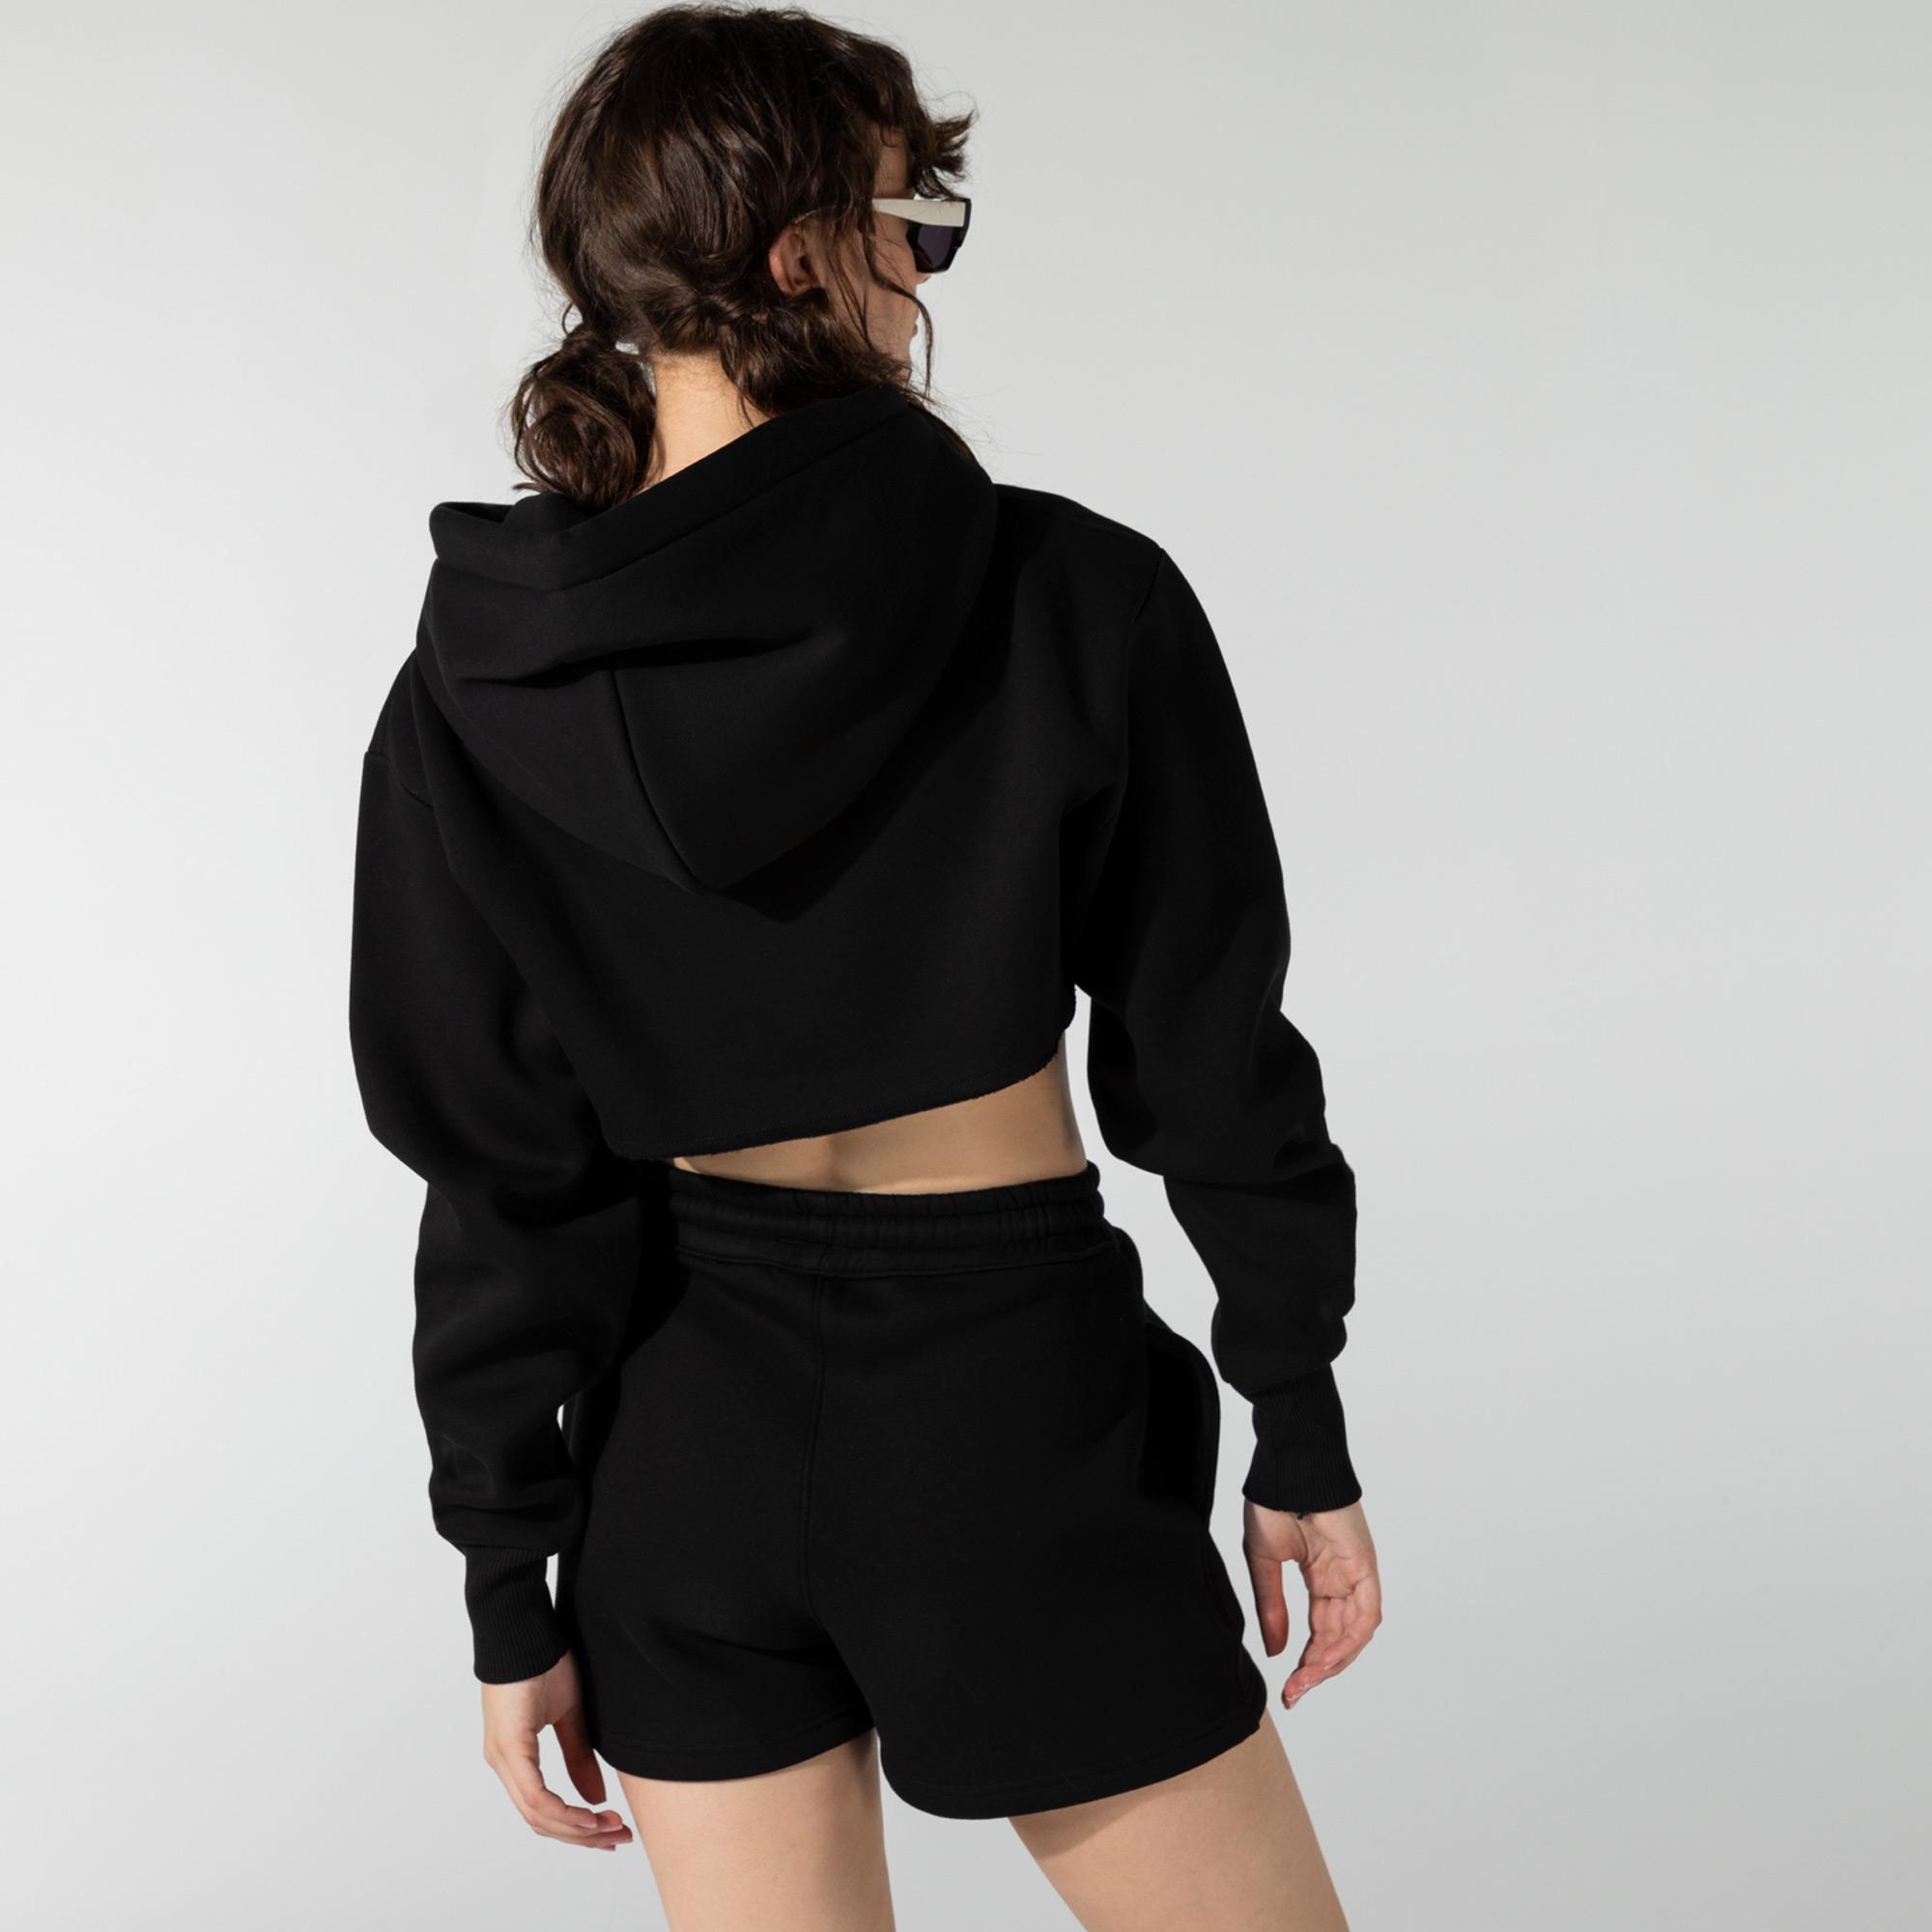 Soon To Be Announced Logo Printed Crop Siyah Kadın Kapüşonlu Sweatshirt